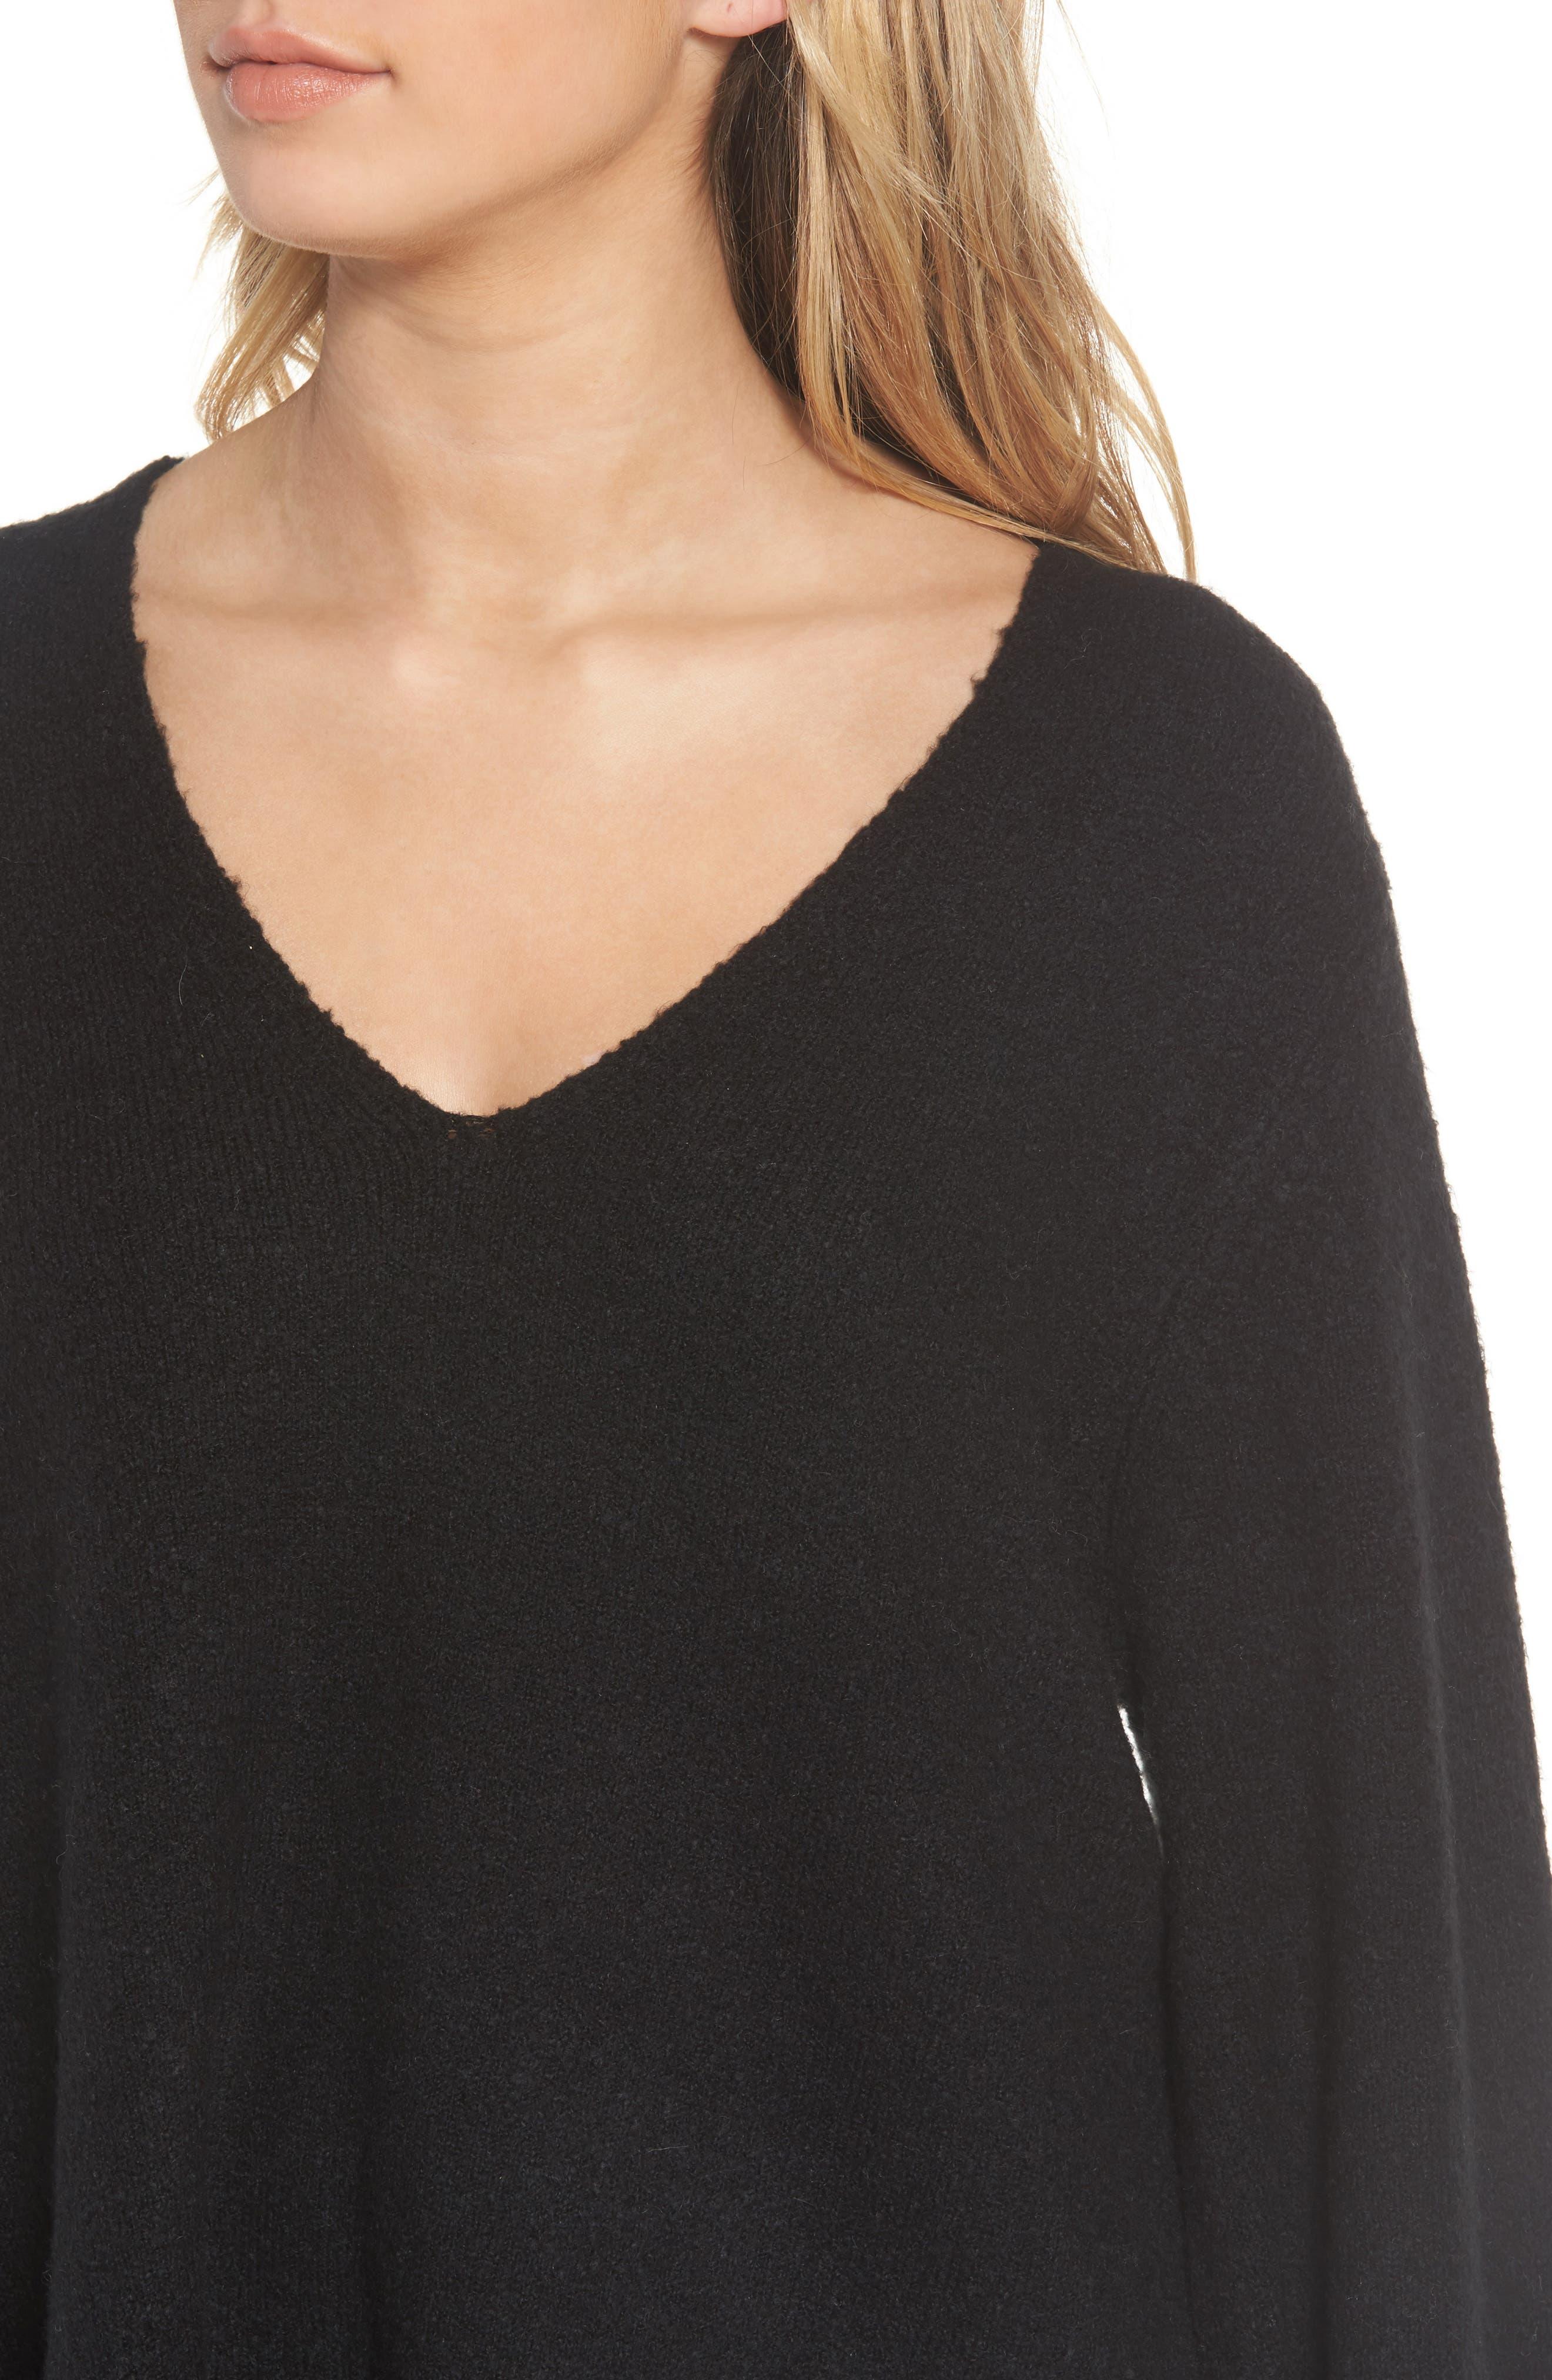 Urban Flossy Sweater,                             Alternate thumbnail 13, color,